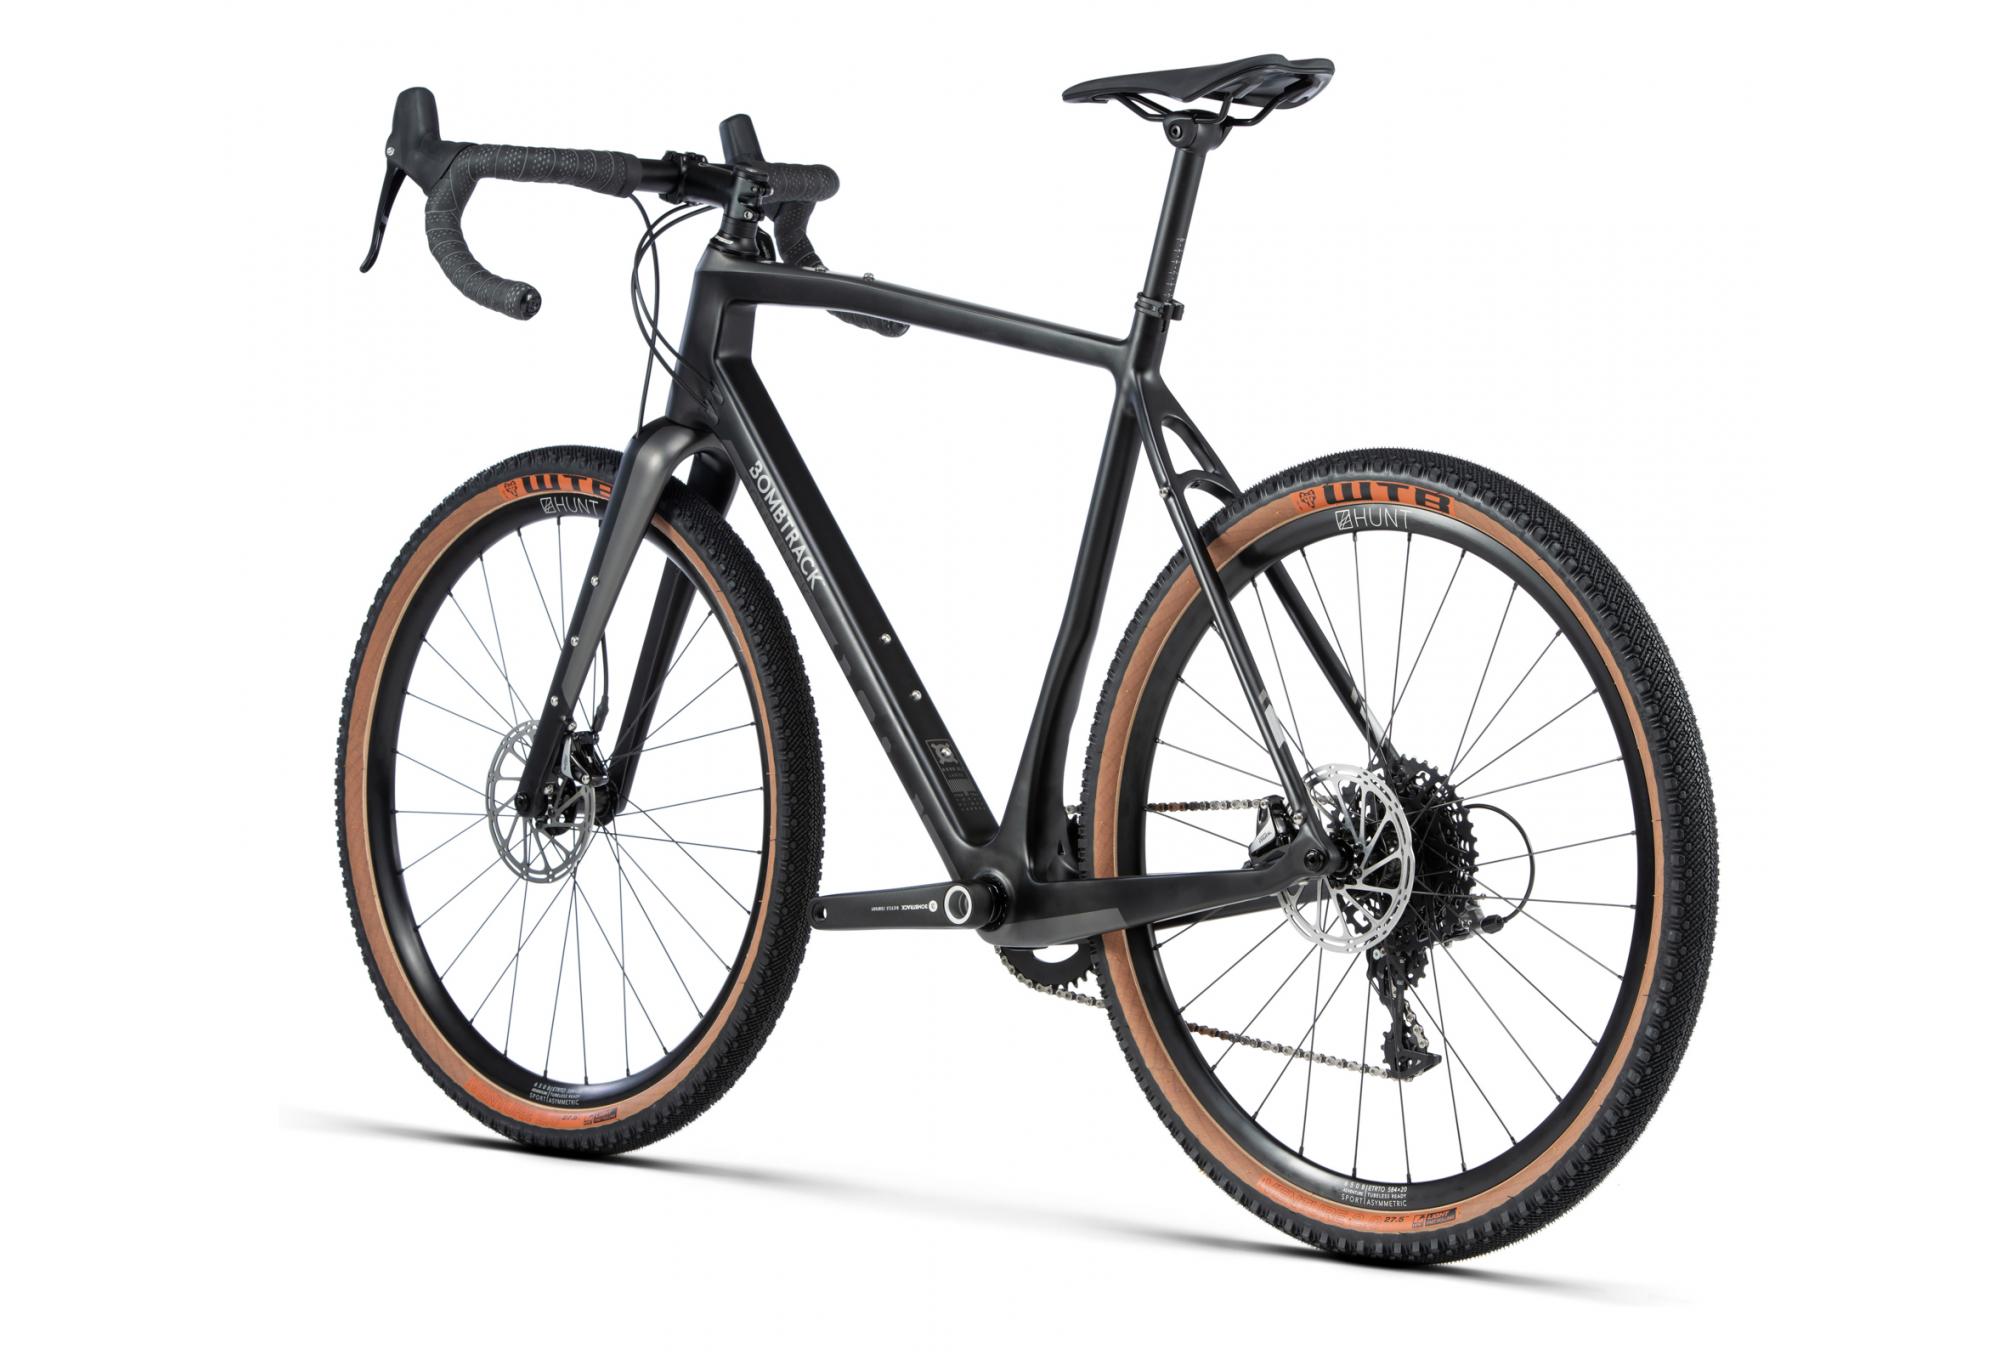 FSA ADVENTURE 46 x 31.8 mm noir route Dropbar guidon de vélo